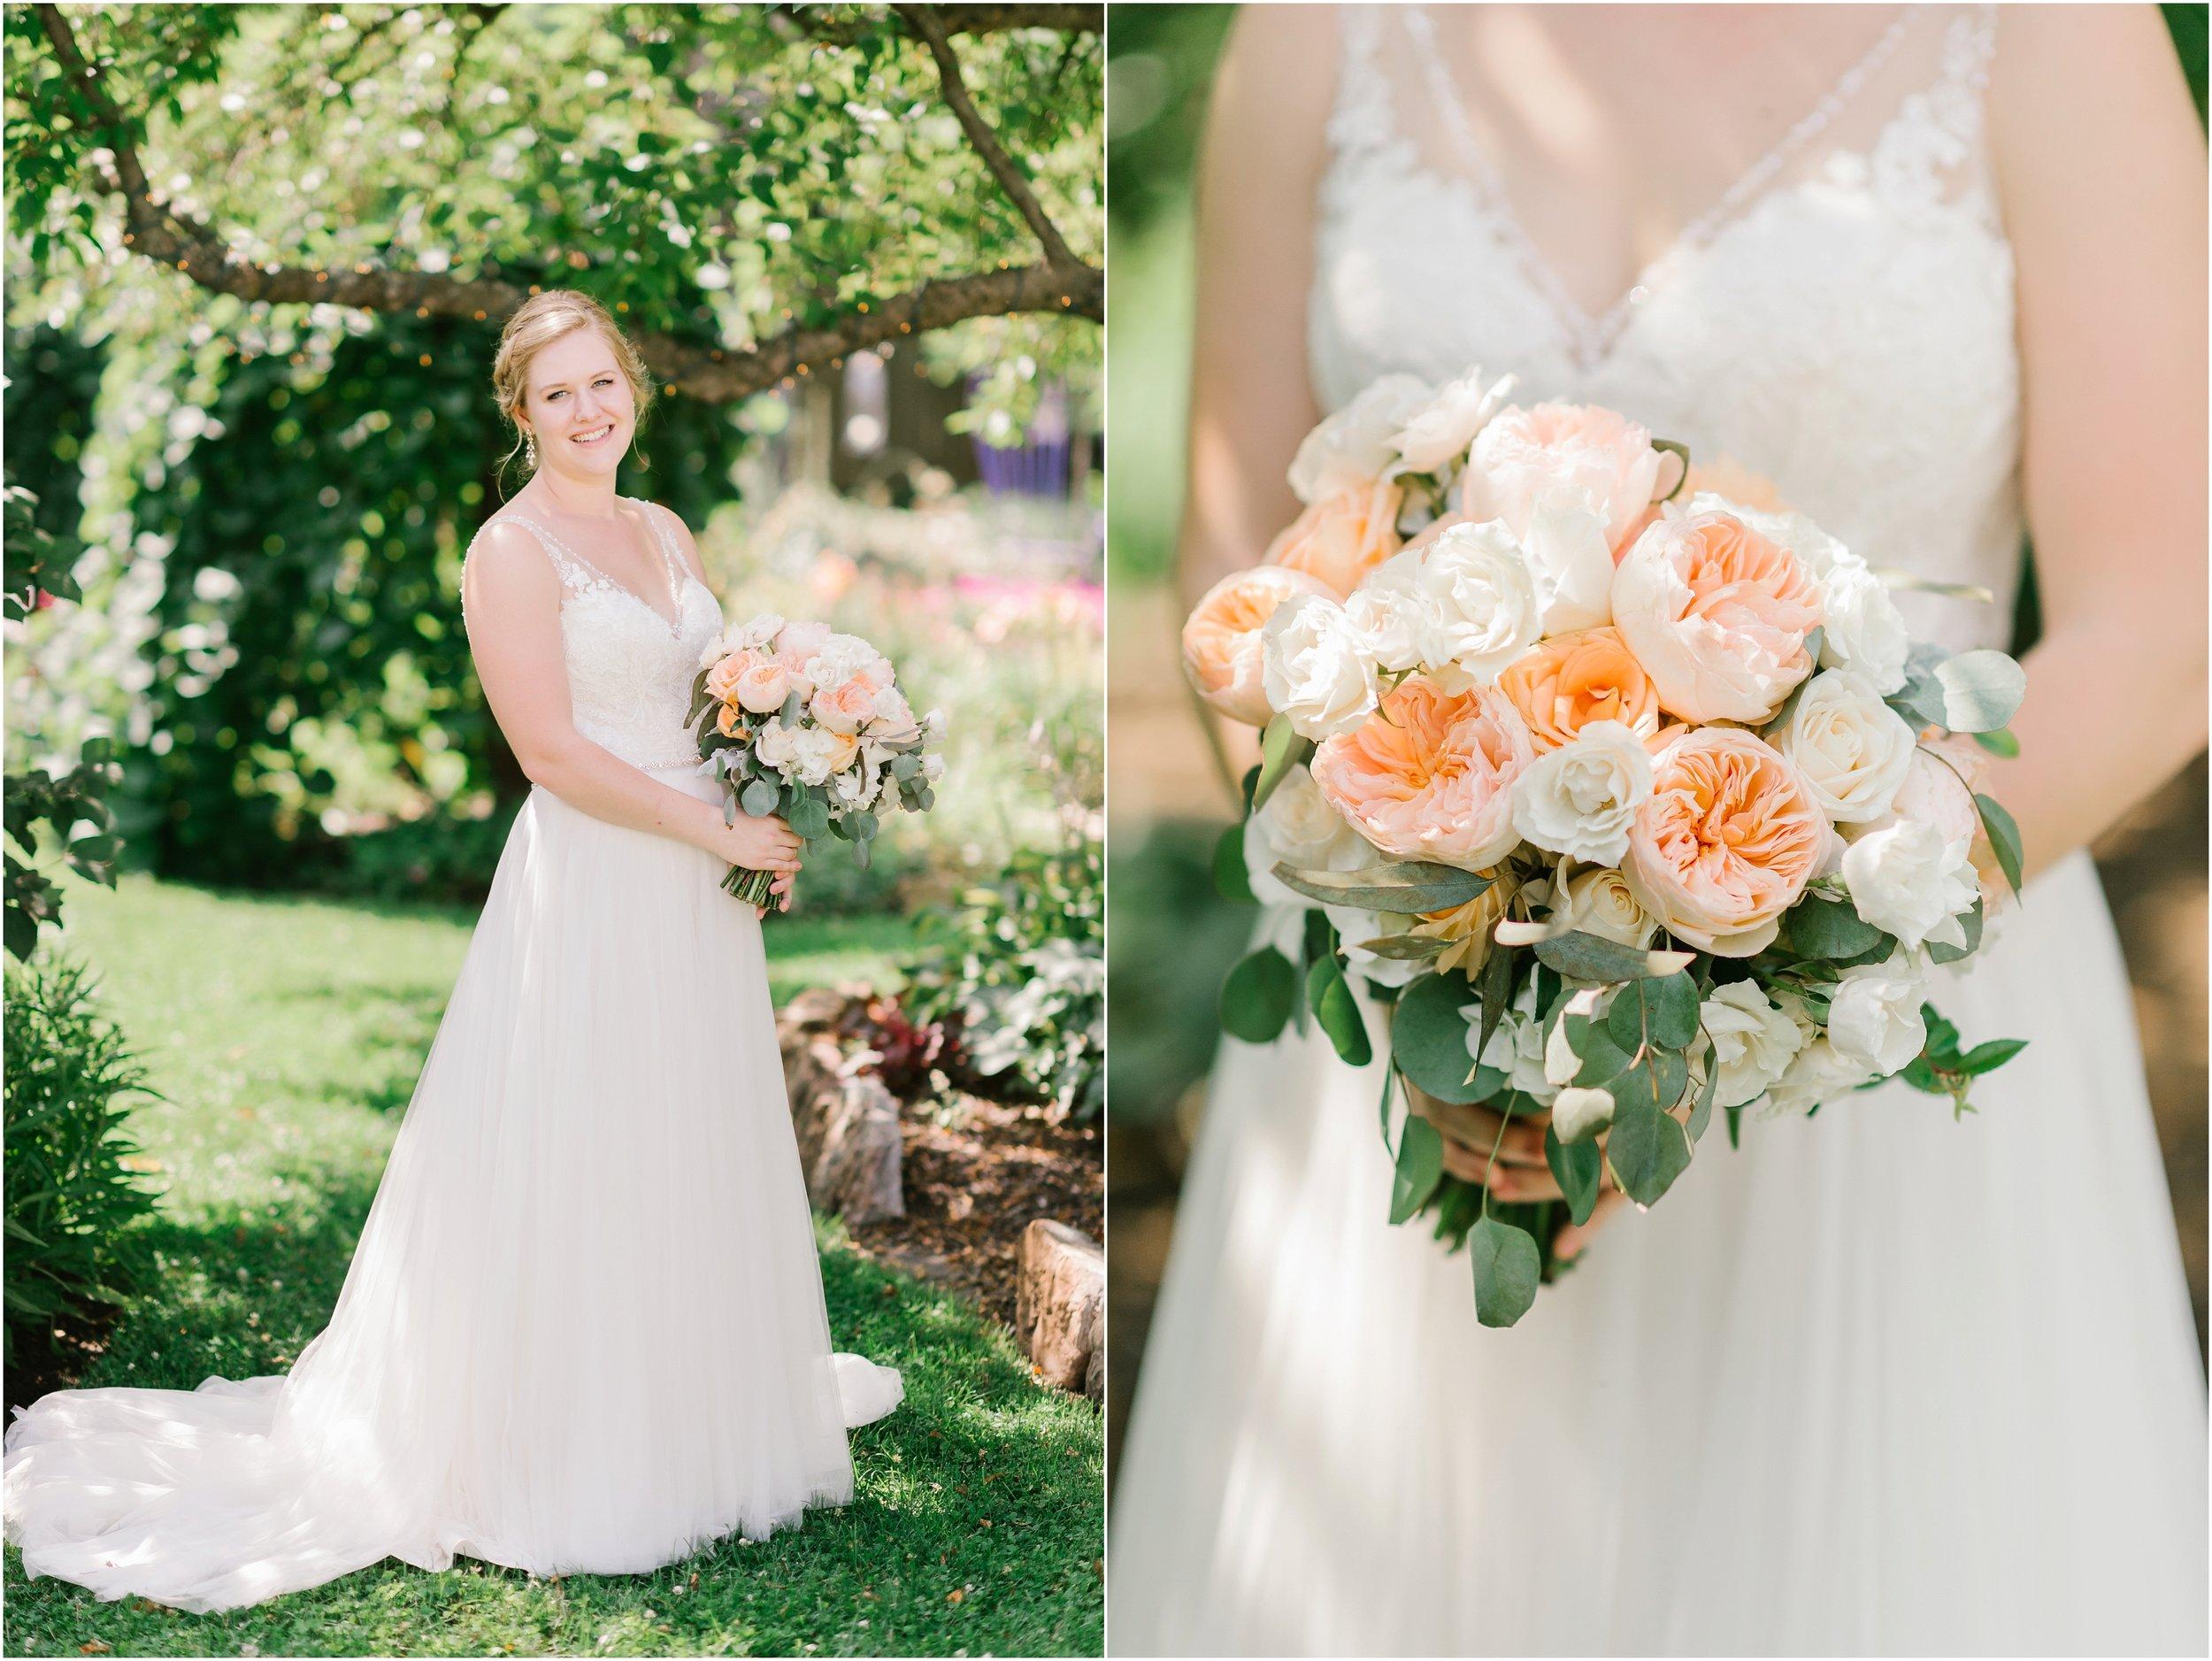 Rebecca_Shehorn_Photography_Indianapolis_Wedding_Photographer_8498.jpg